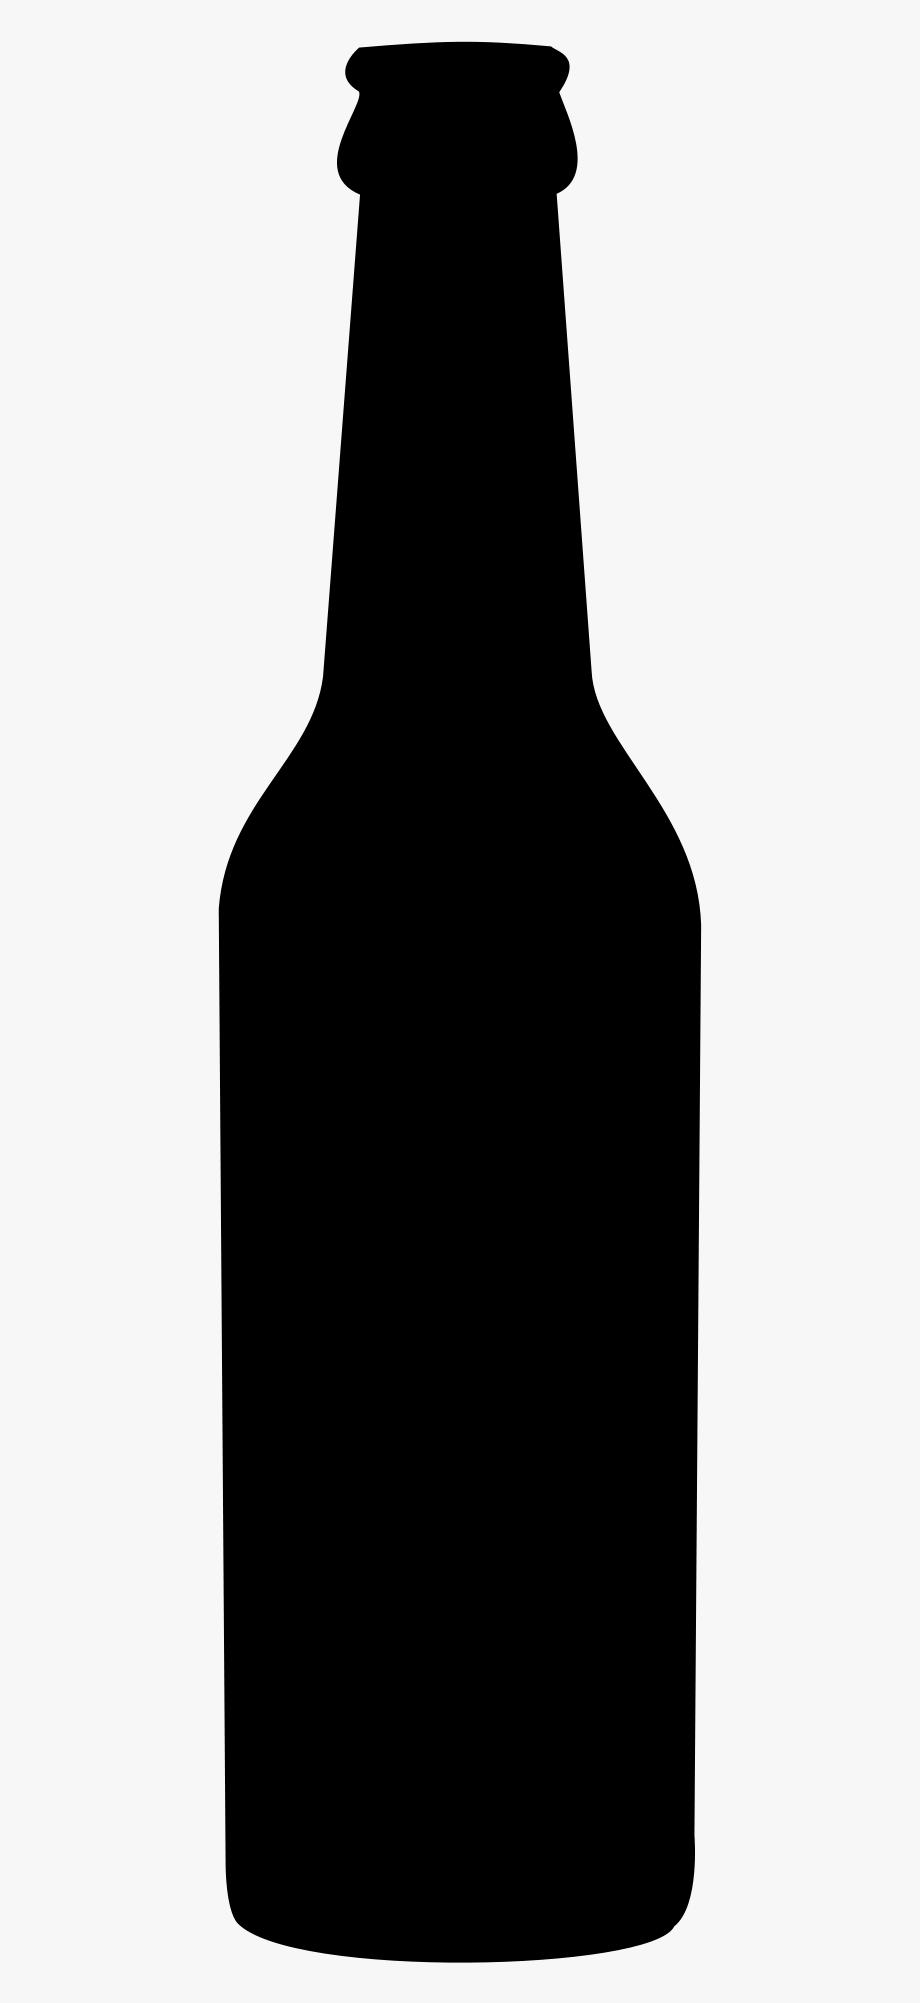 Beer Bottle Black Clipart.